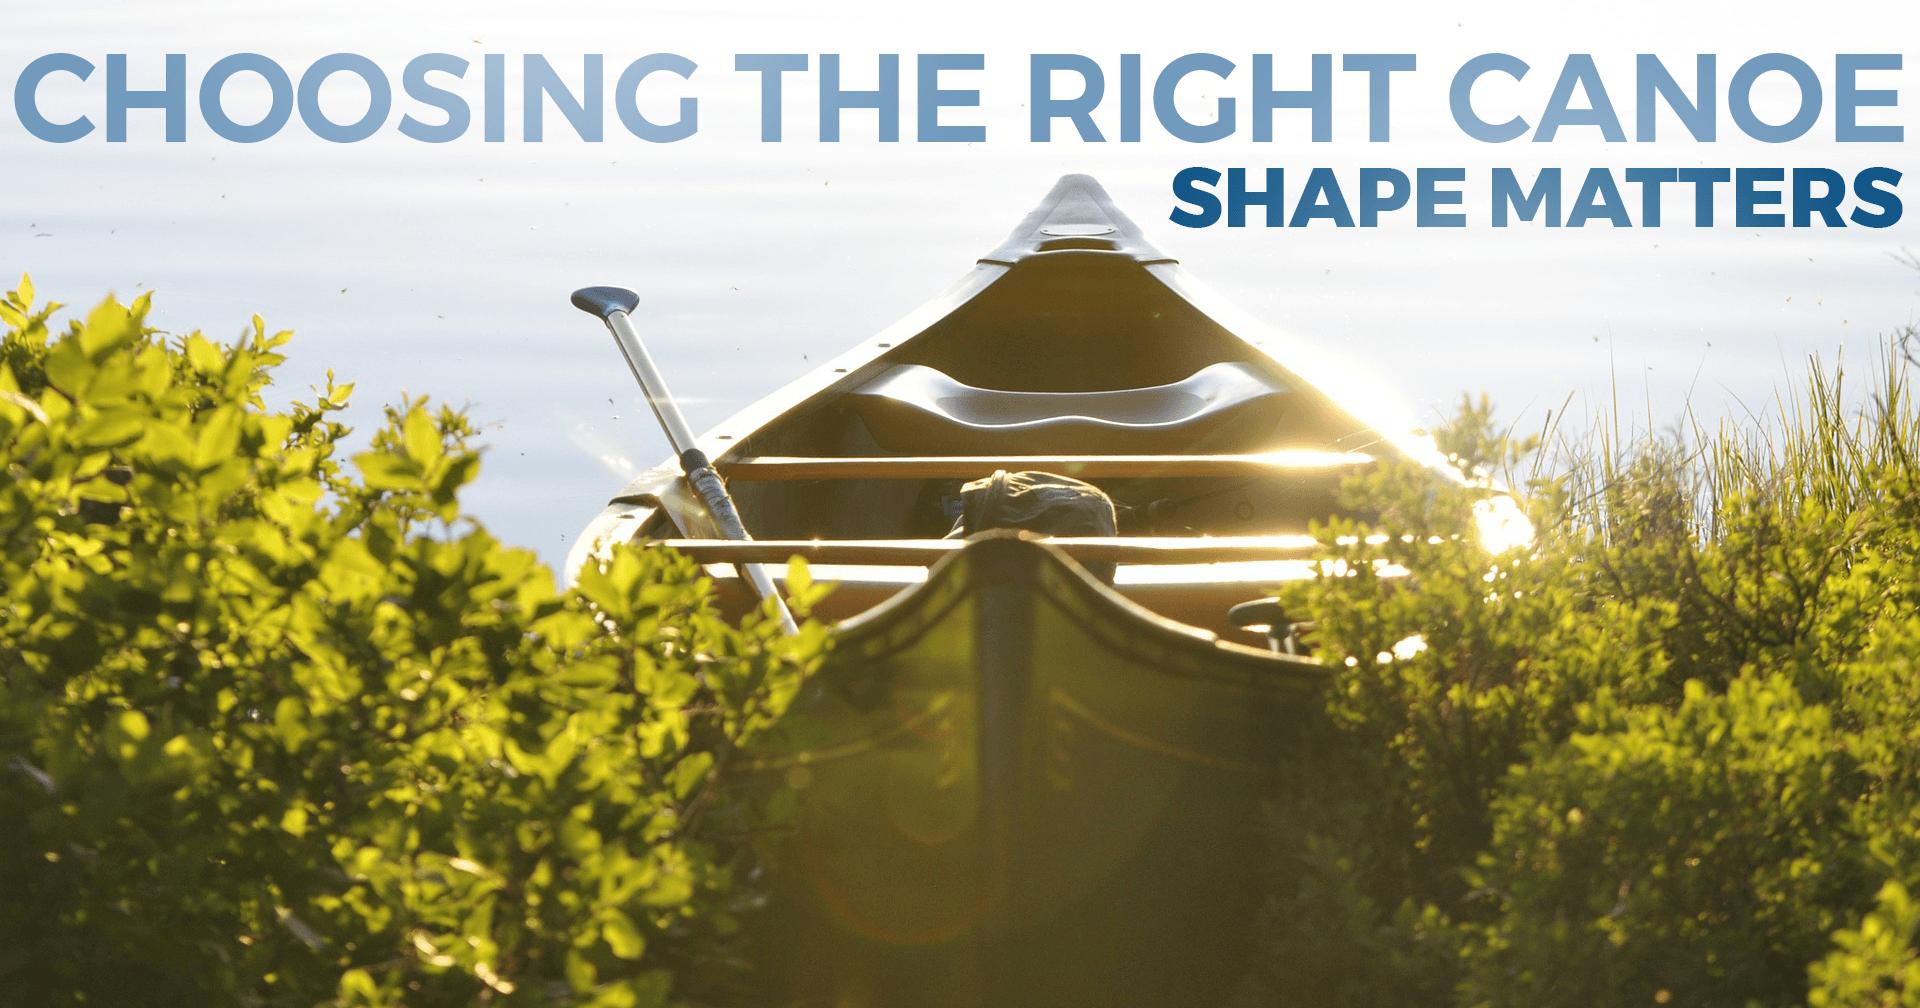 Choosing the Right Canoe - Shape Matters